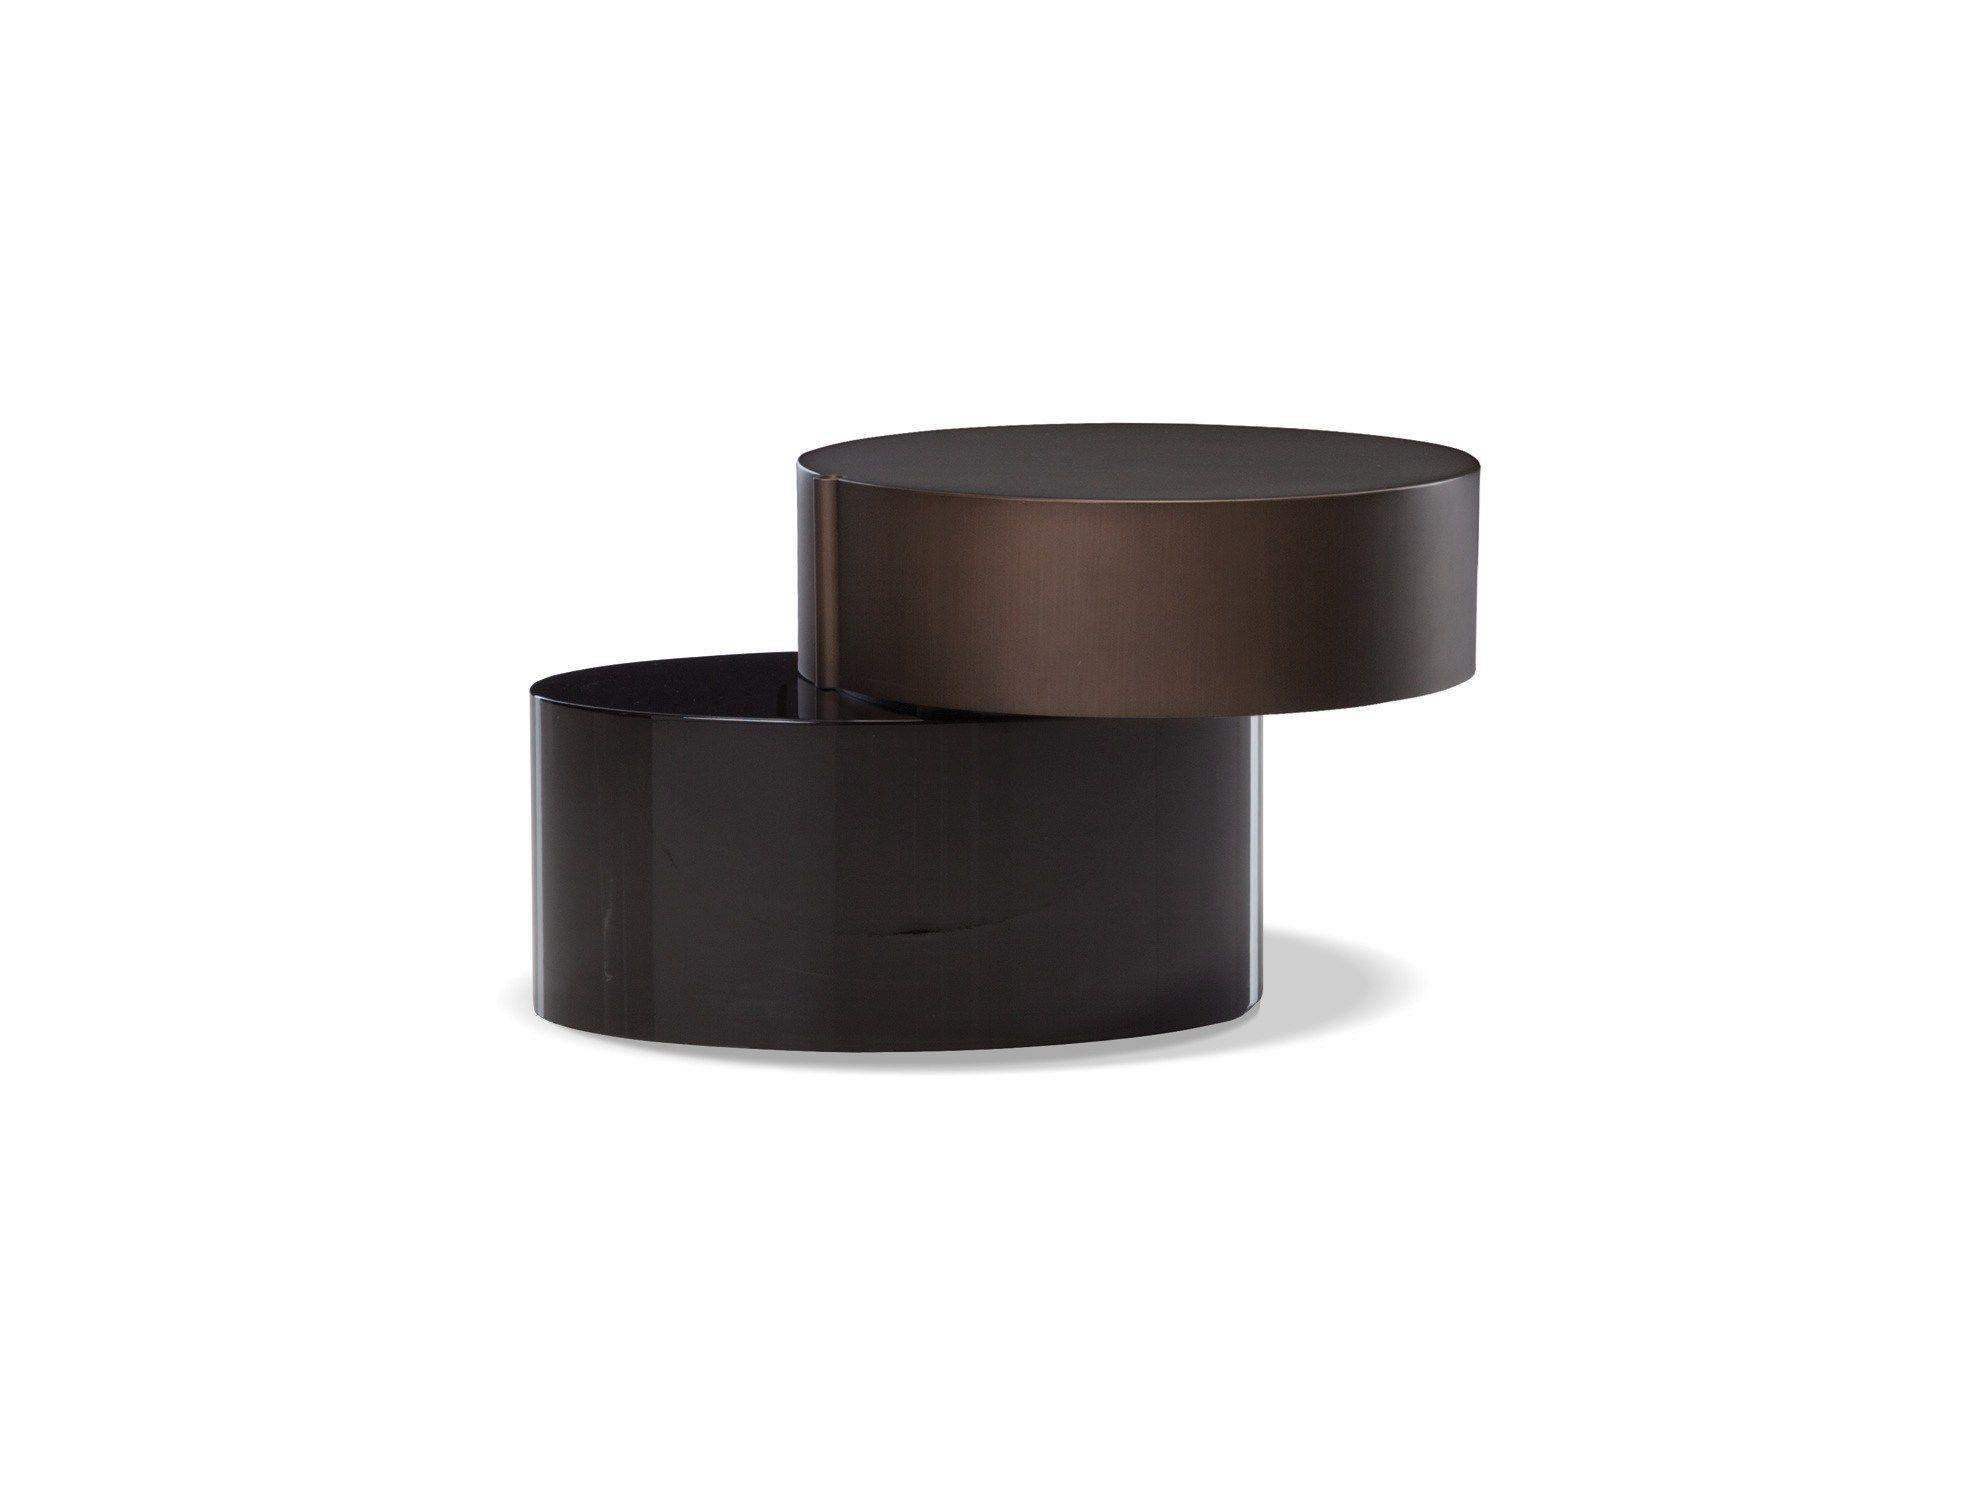 Mesa de centro baixa BENSON by Minotti | design Rodolfo Dordoni